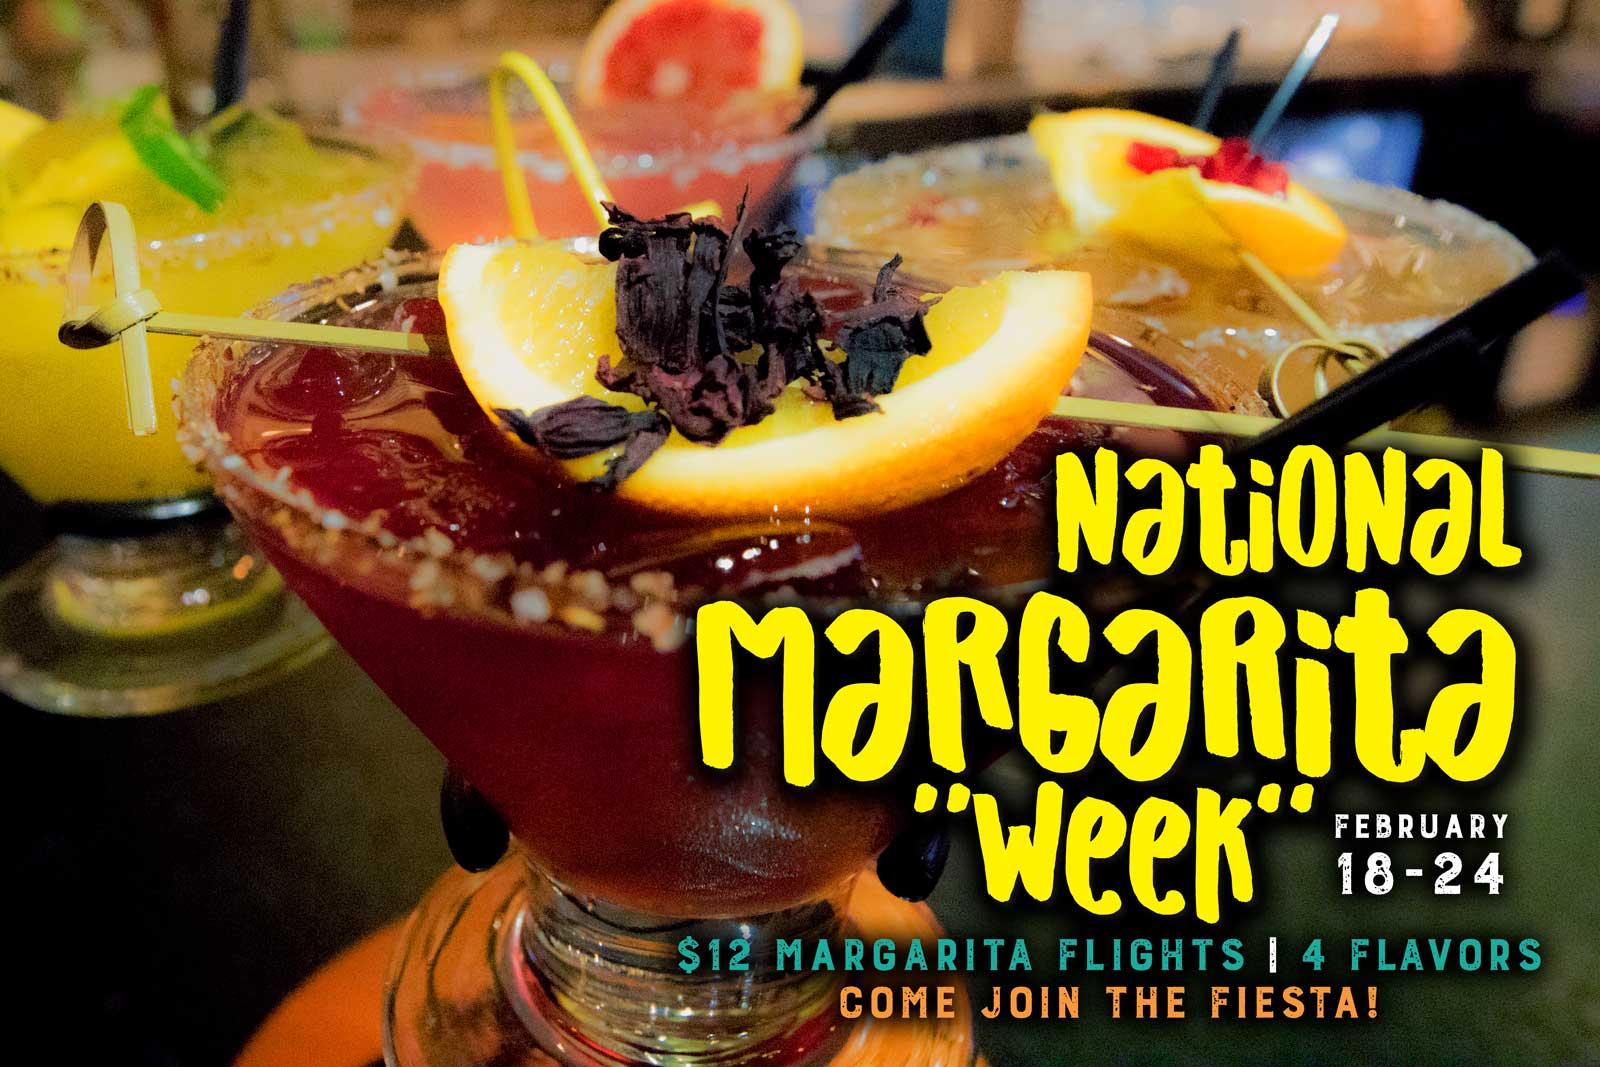 Margaritafly.jpg